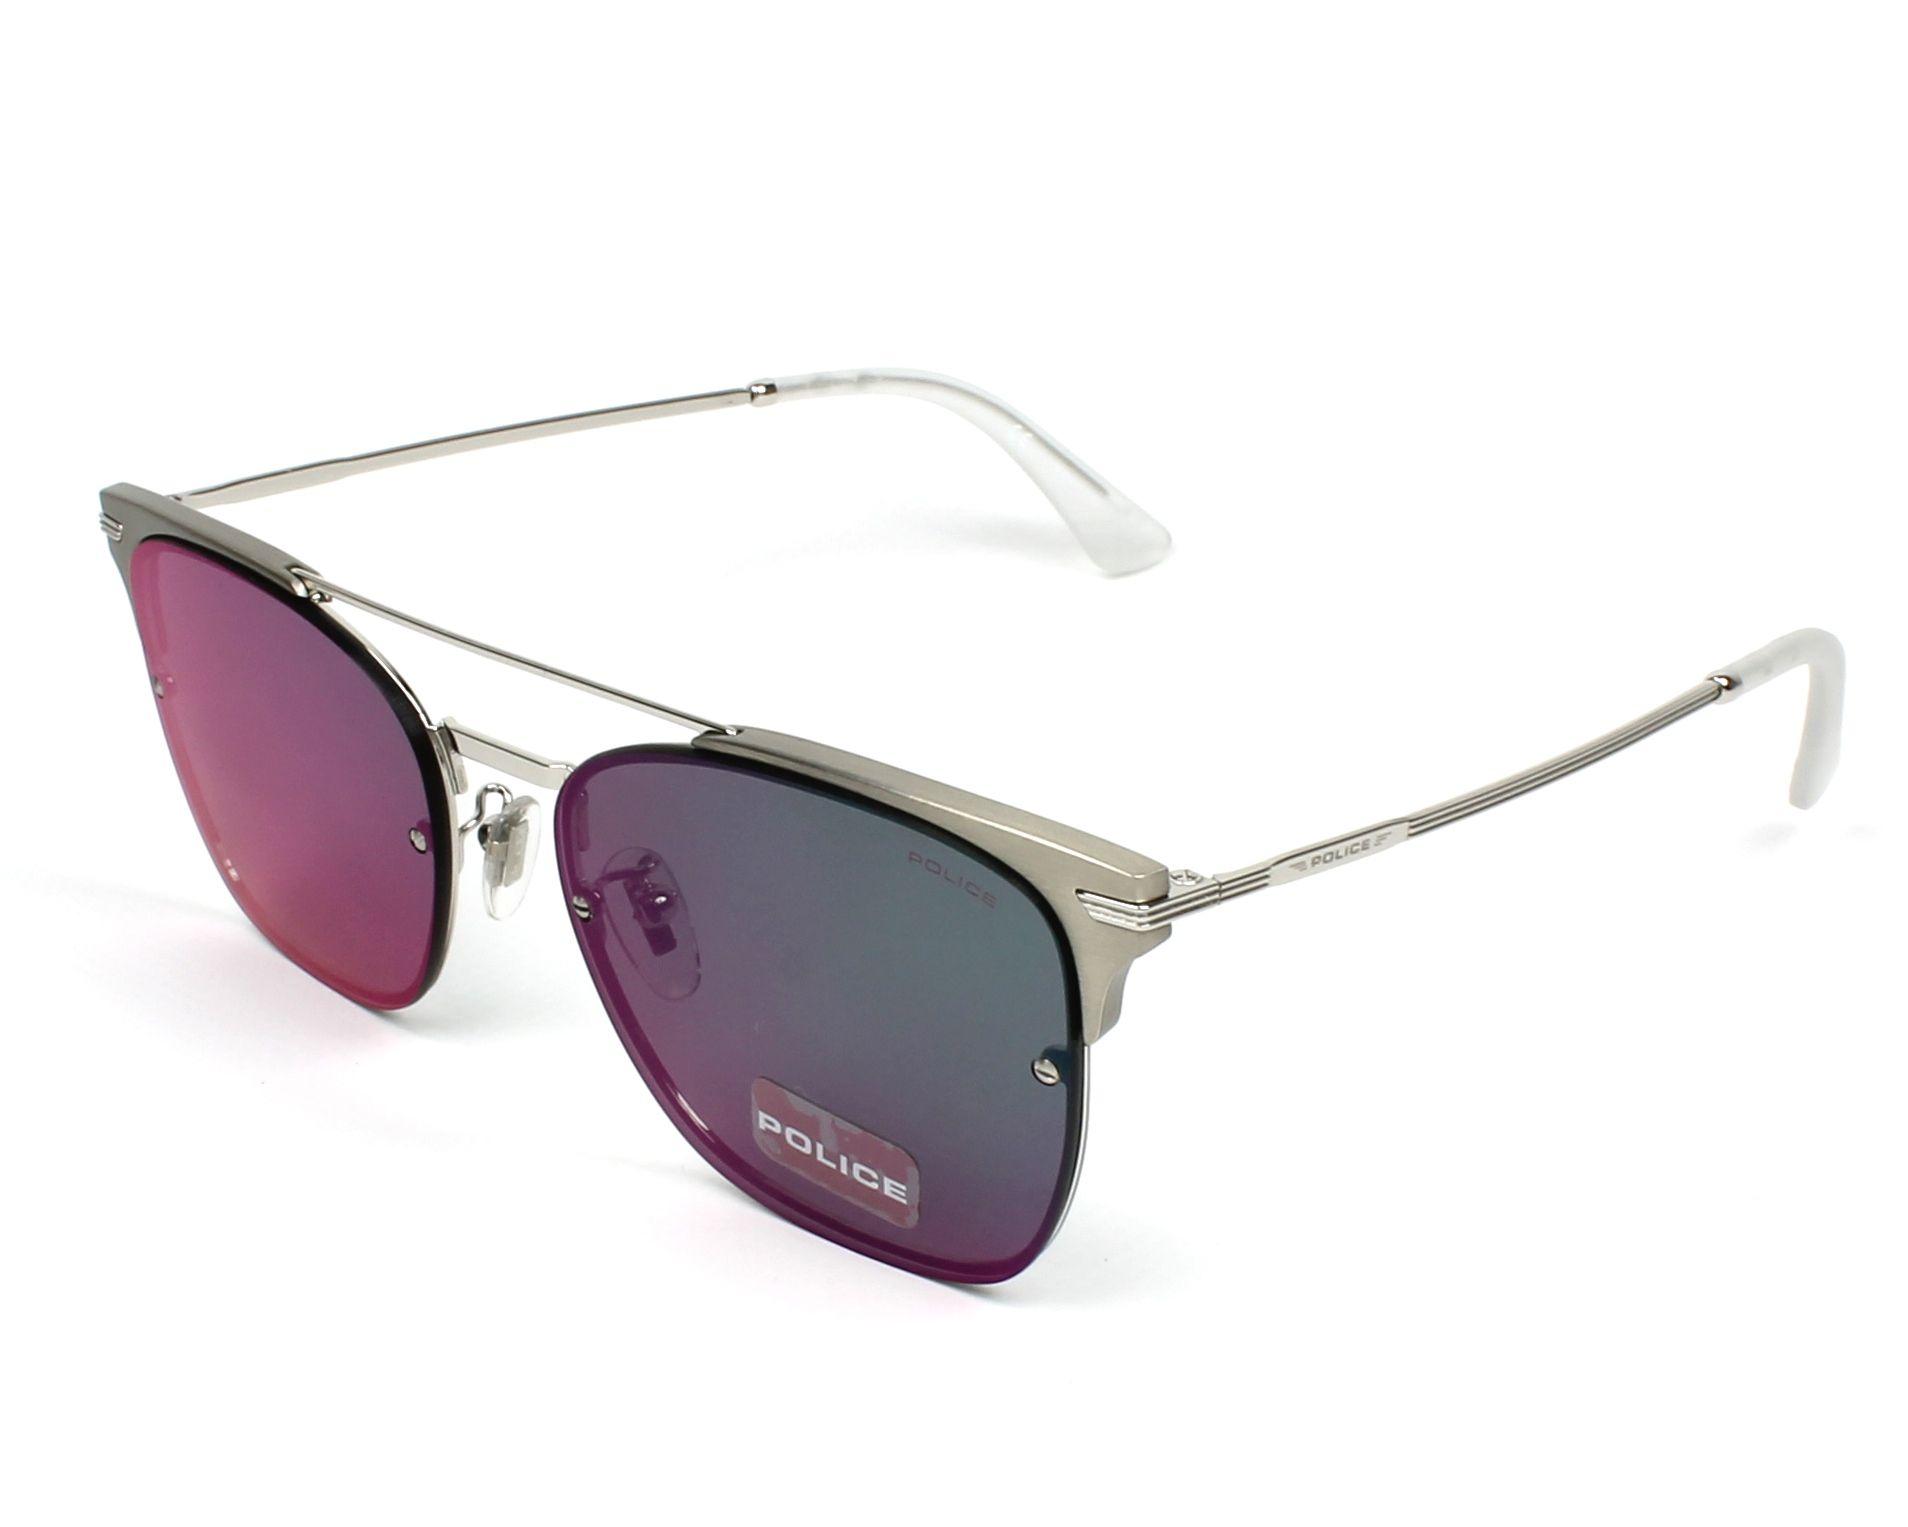 441bda17823 Sunglasses Police SPL-577 579V 56-17 Silver Gun profile view